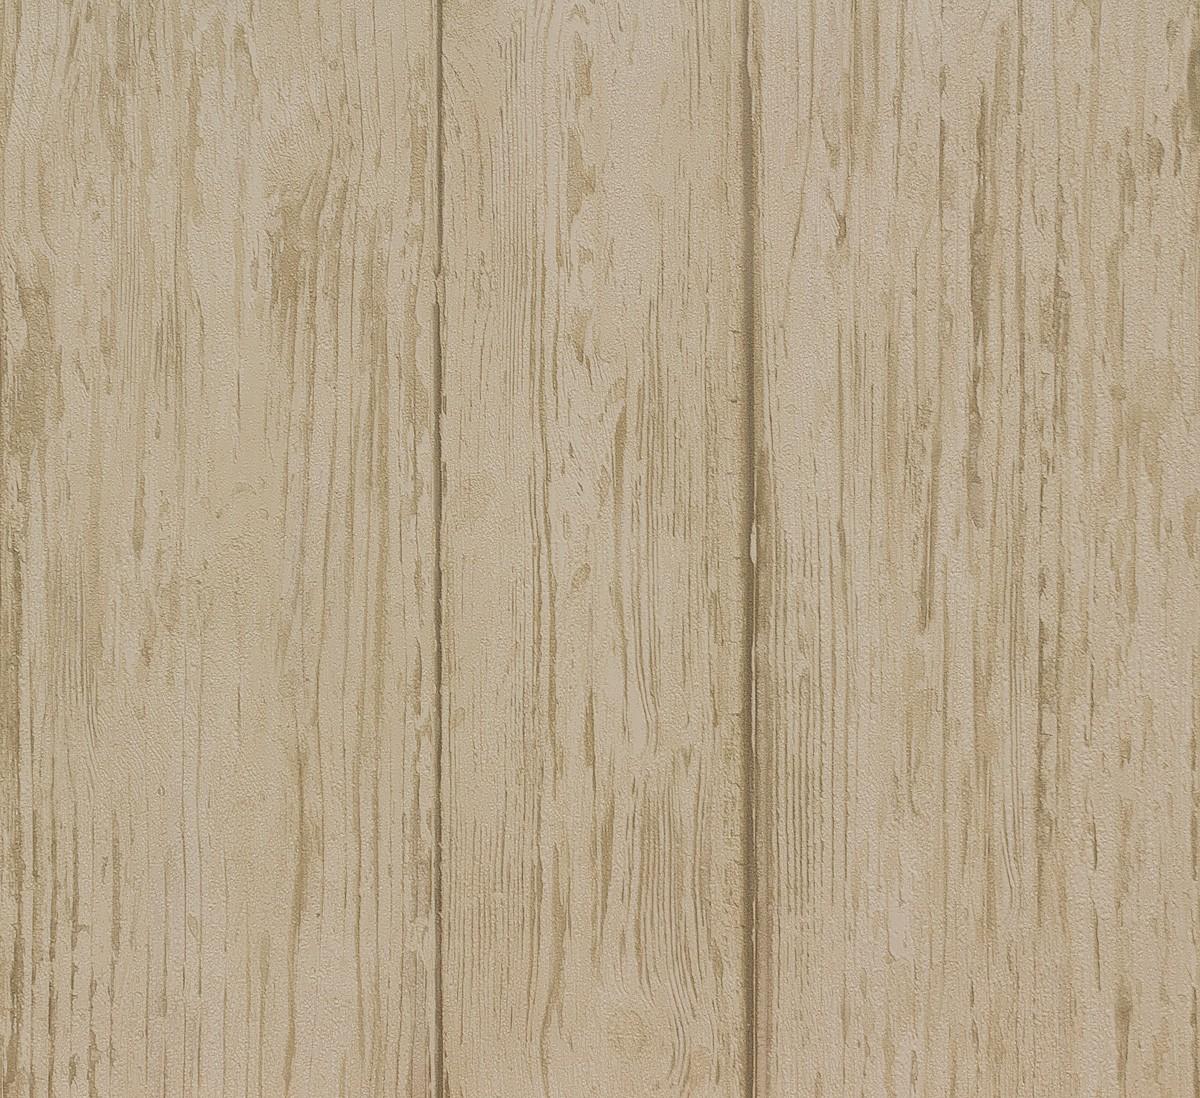 tapete vlies holz creme marburg attitude 56202. Black Bedroom Furniture Sets. Home Design Ideas